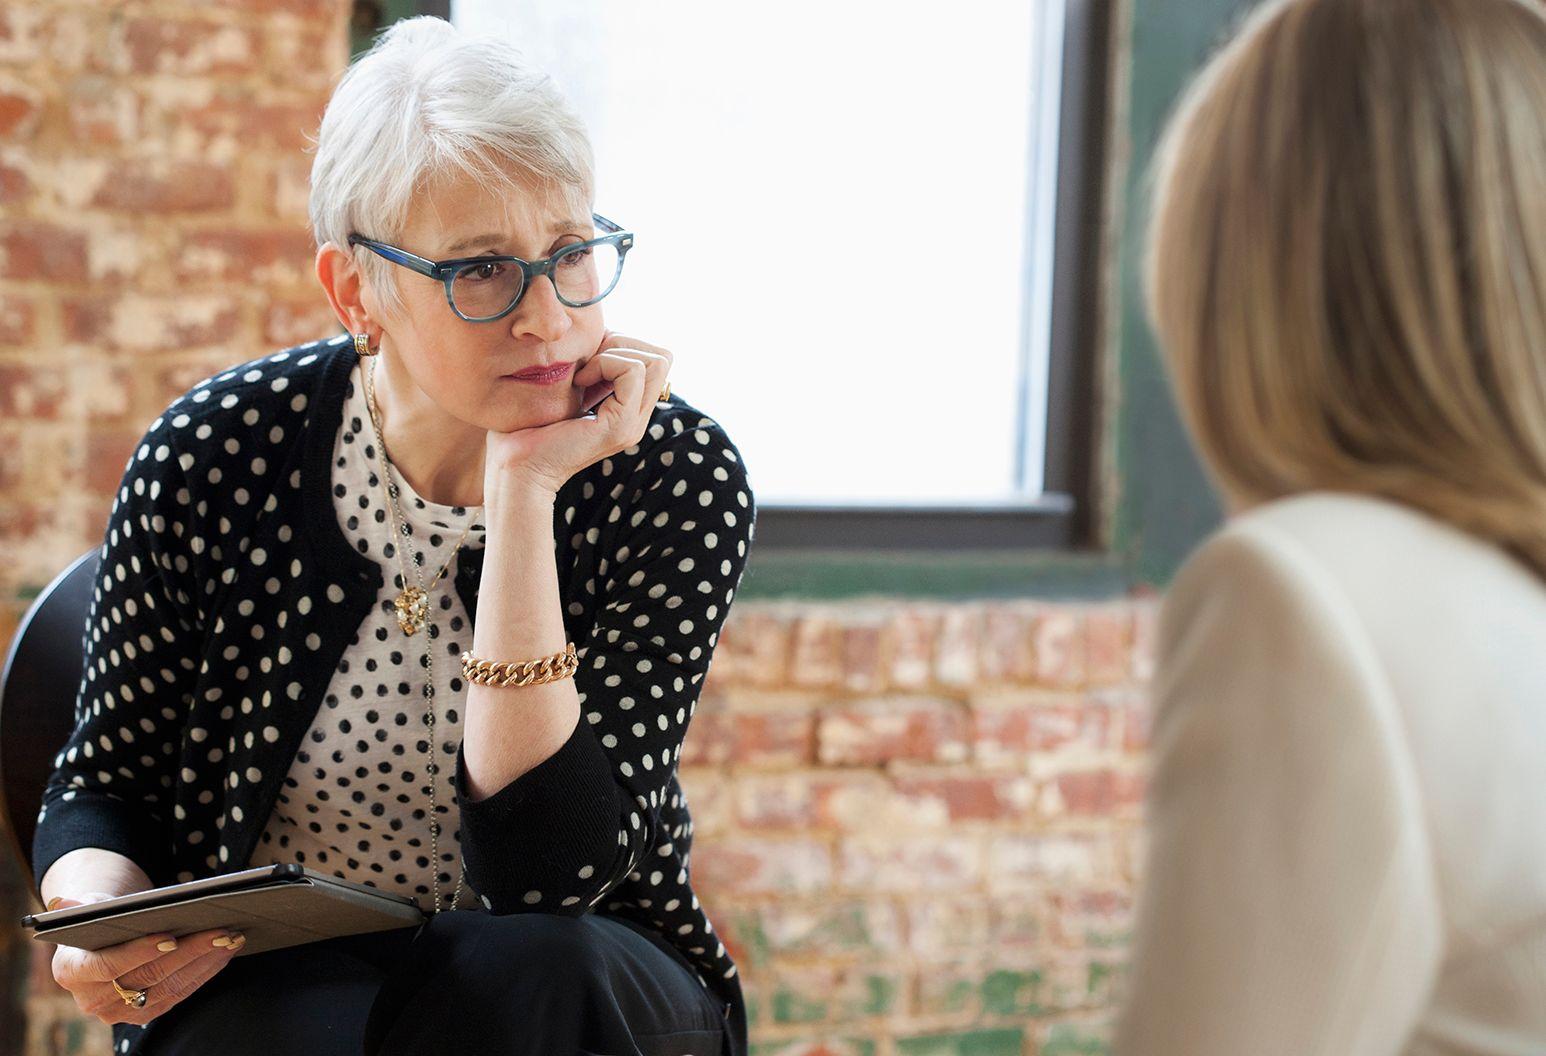 Caucasian businesswomen talking in office with digital tablet